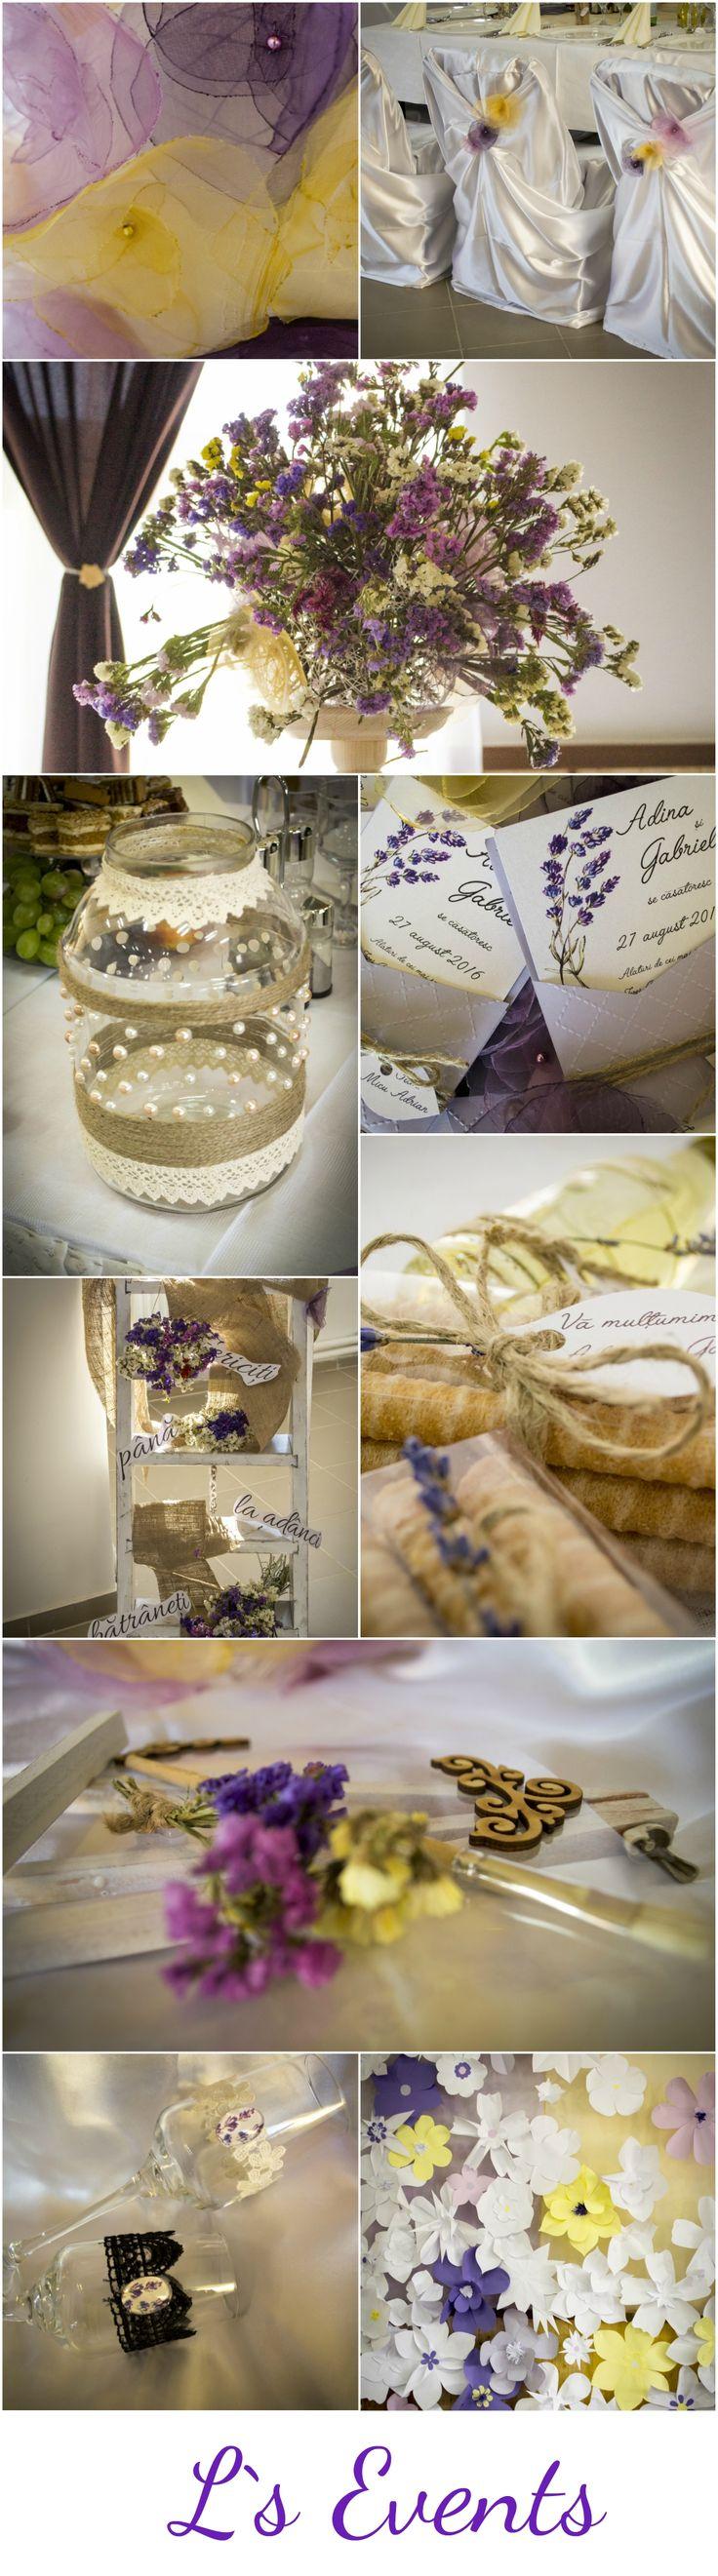 wedding inspiration rustic elegant boho chic, shabby chic wedding